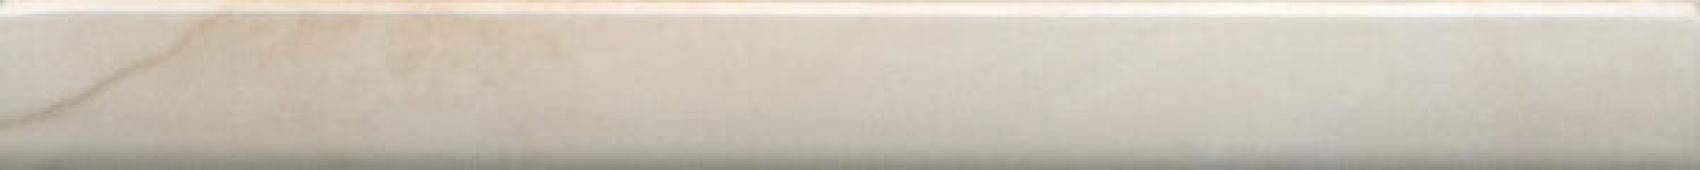 PFE020 Карандаш Стеллине бежевый светлый 20*2 бордюр